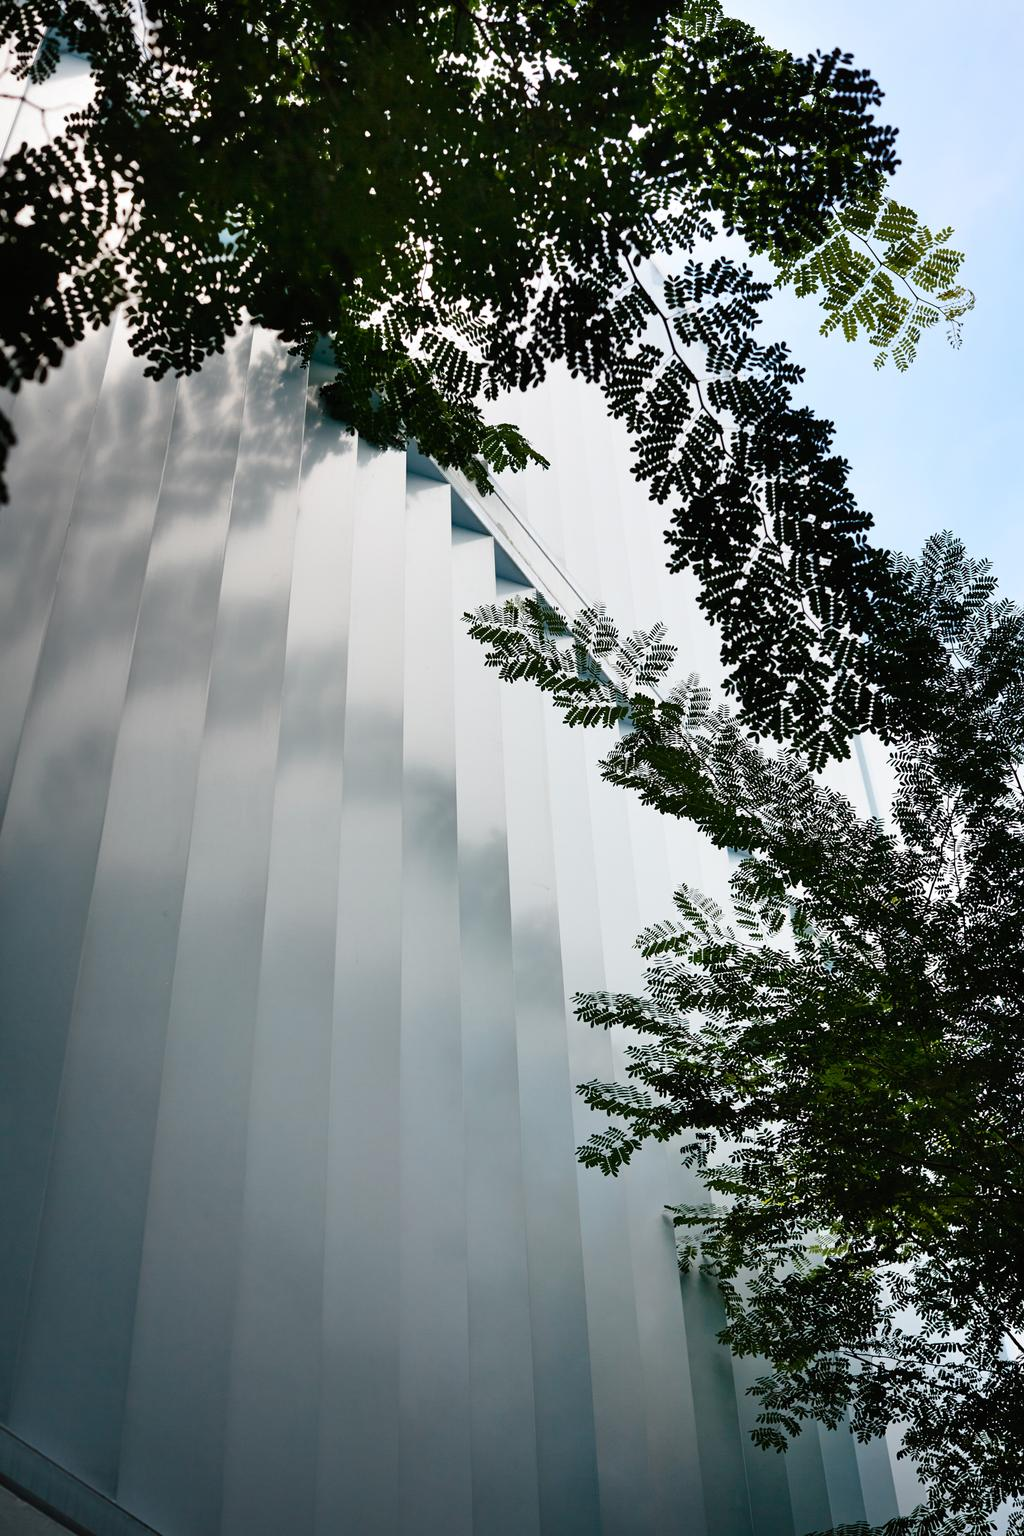 Contemporary, Landed, Primose Avenue, Architect, HYLA Architects, Fern, Flora, Plant, Abies, Conifer, Fir, Tree